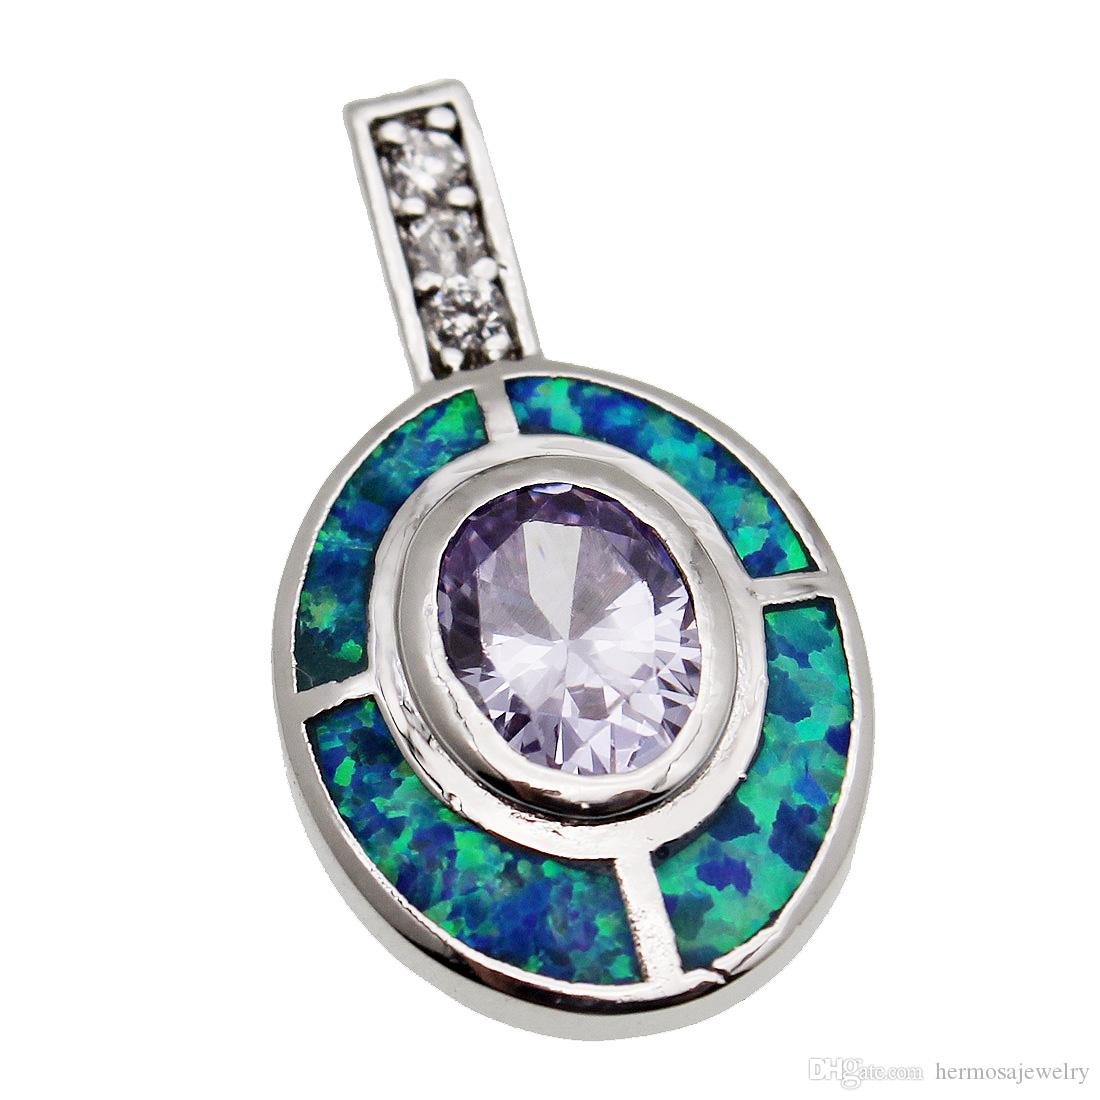 925 Sterling Silver Pendants Natural Light Purple Amethyst Genuine Unique Blue Opal Handmade Solitaire Female Jewelry